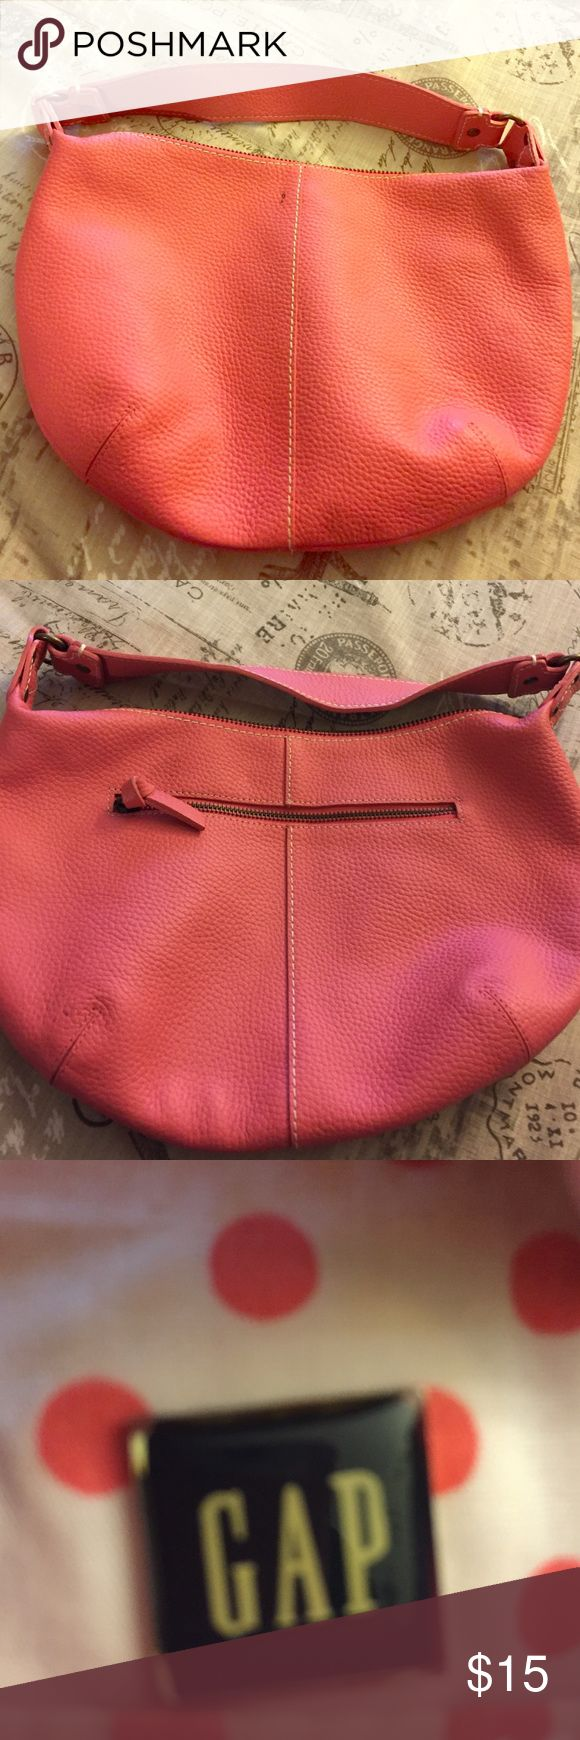 Pink gap purse Pink purse GAP Bags Totes